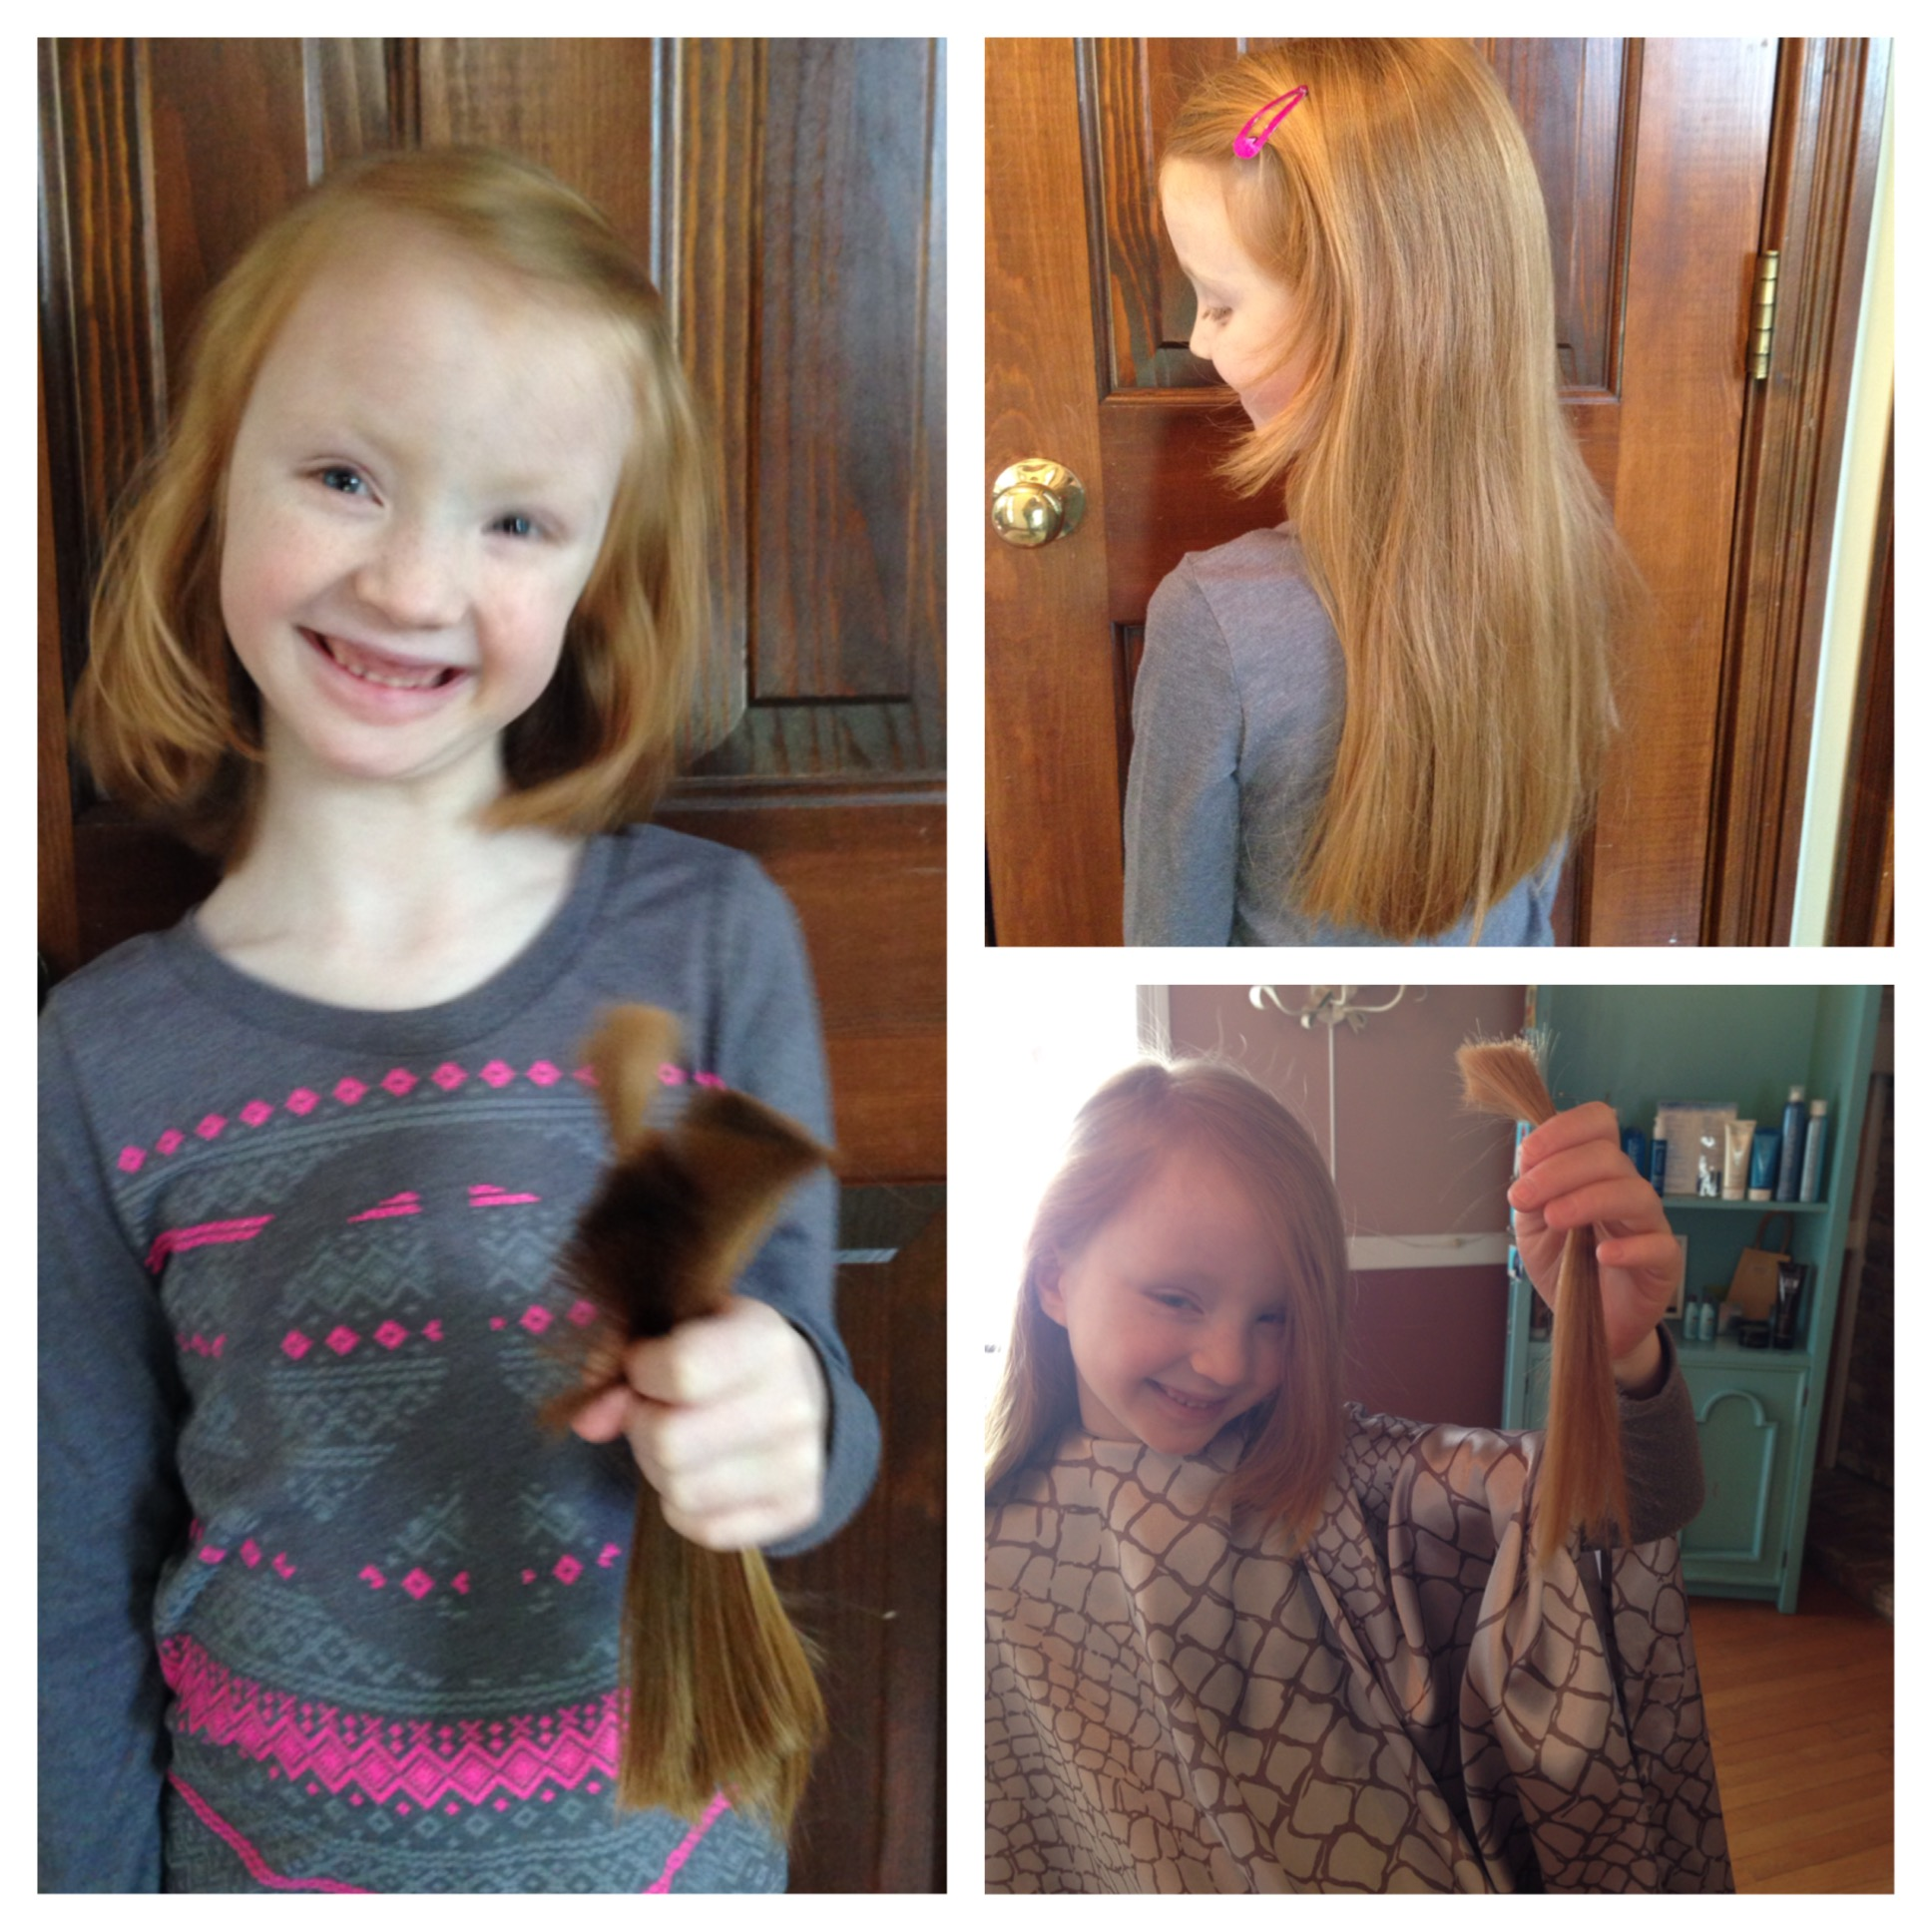 Pantene Beautiful Lengths hair donation